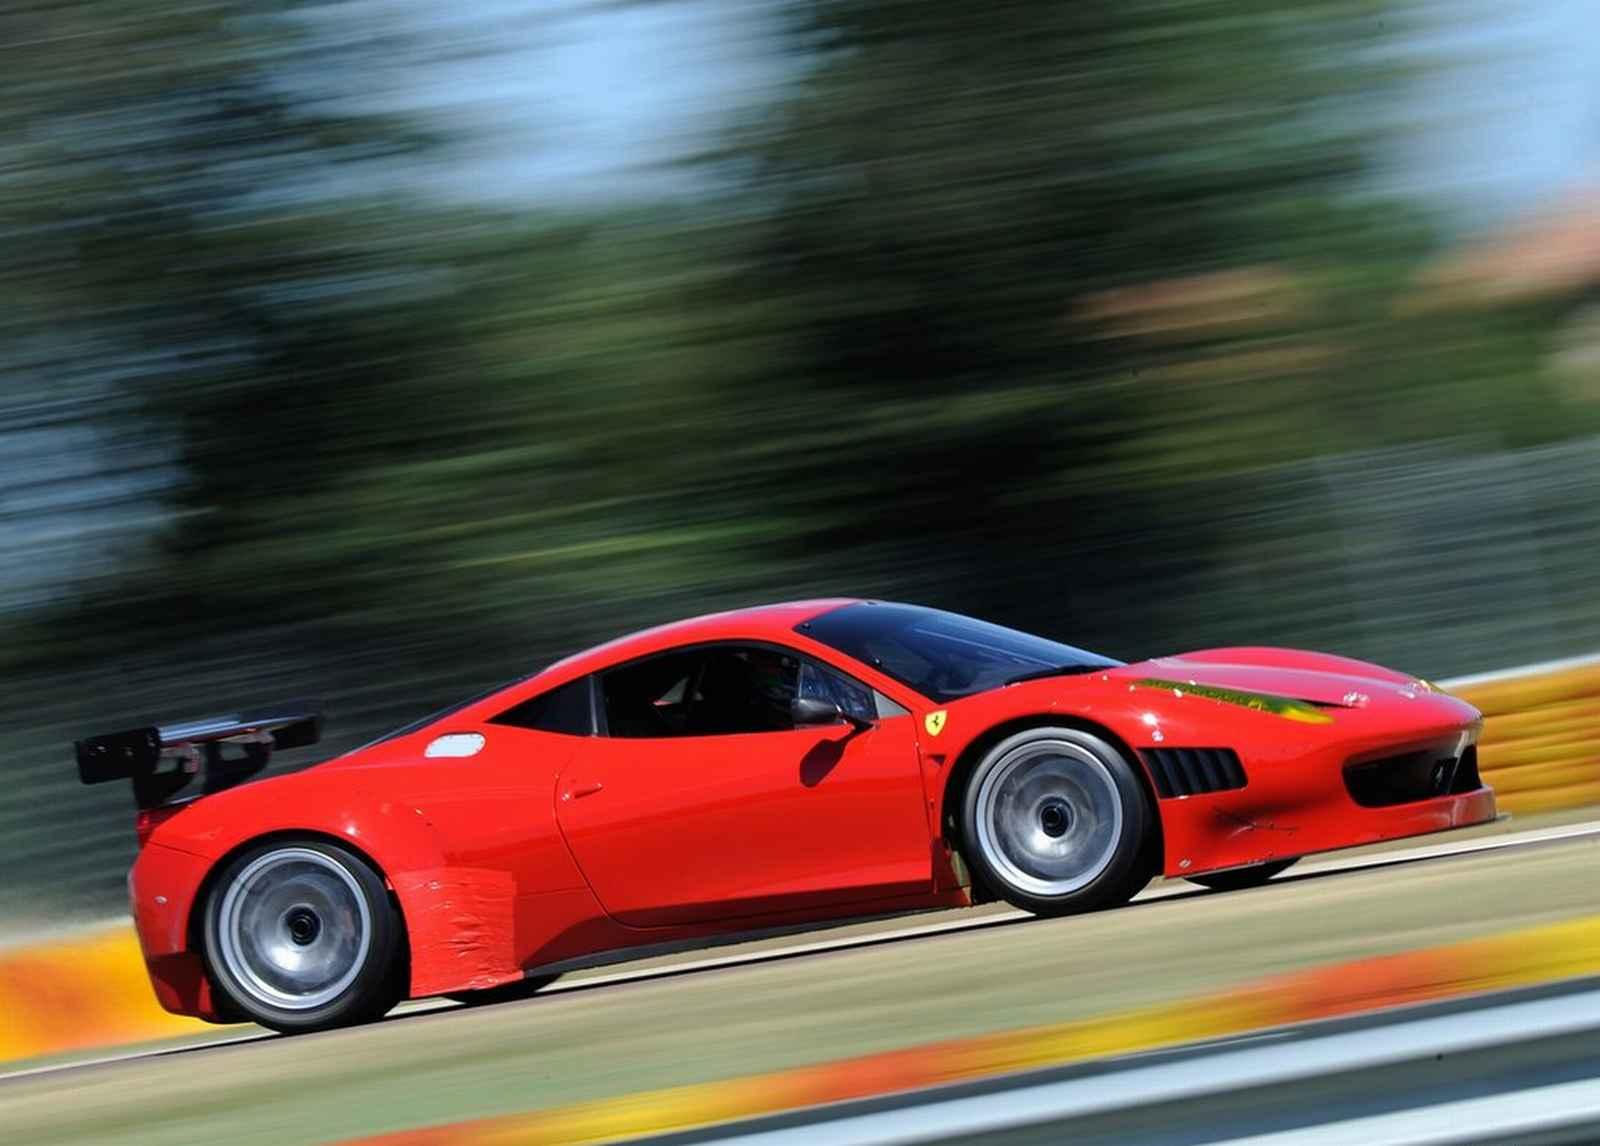 http://4.bp.blogspot.com/-9FH-u_7o3vk/T_gaoPzPF6I/AAAAAAAABQ4/xeAMmg4Y-Lk/s1600/Ferrari-458-Italia-Grand-Am.jpg